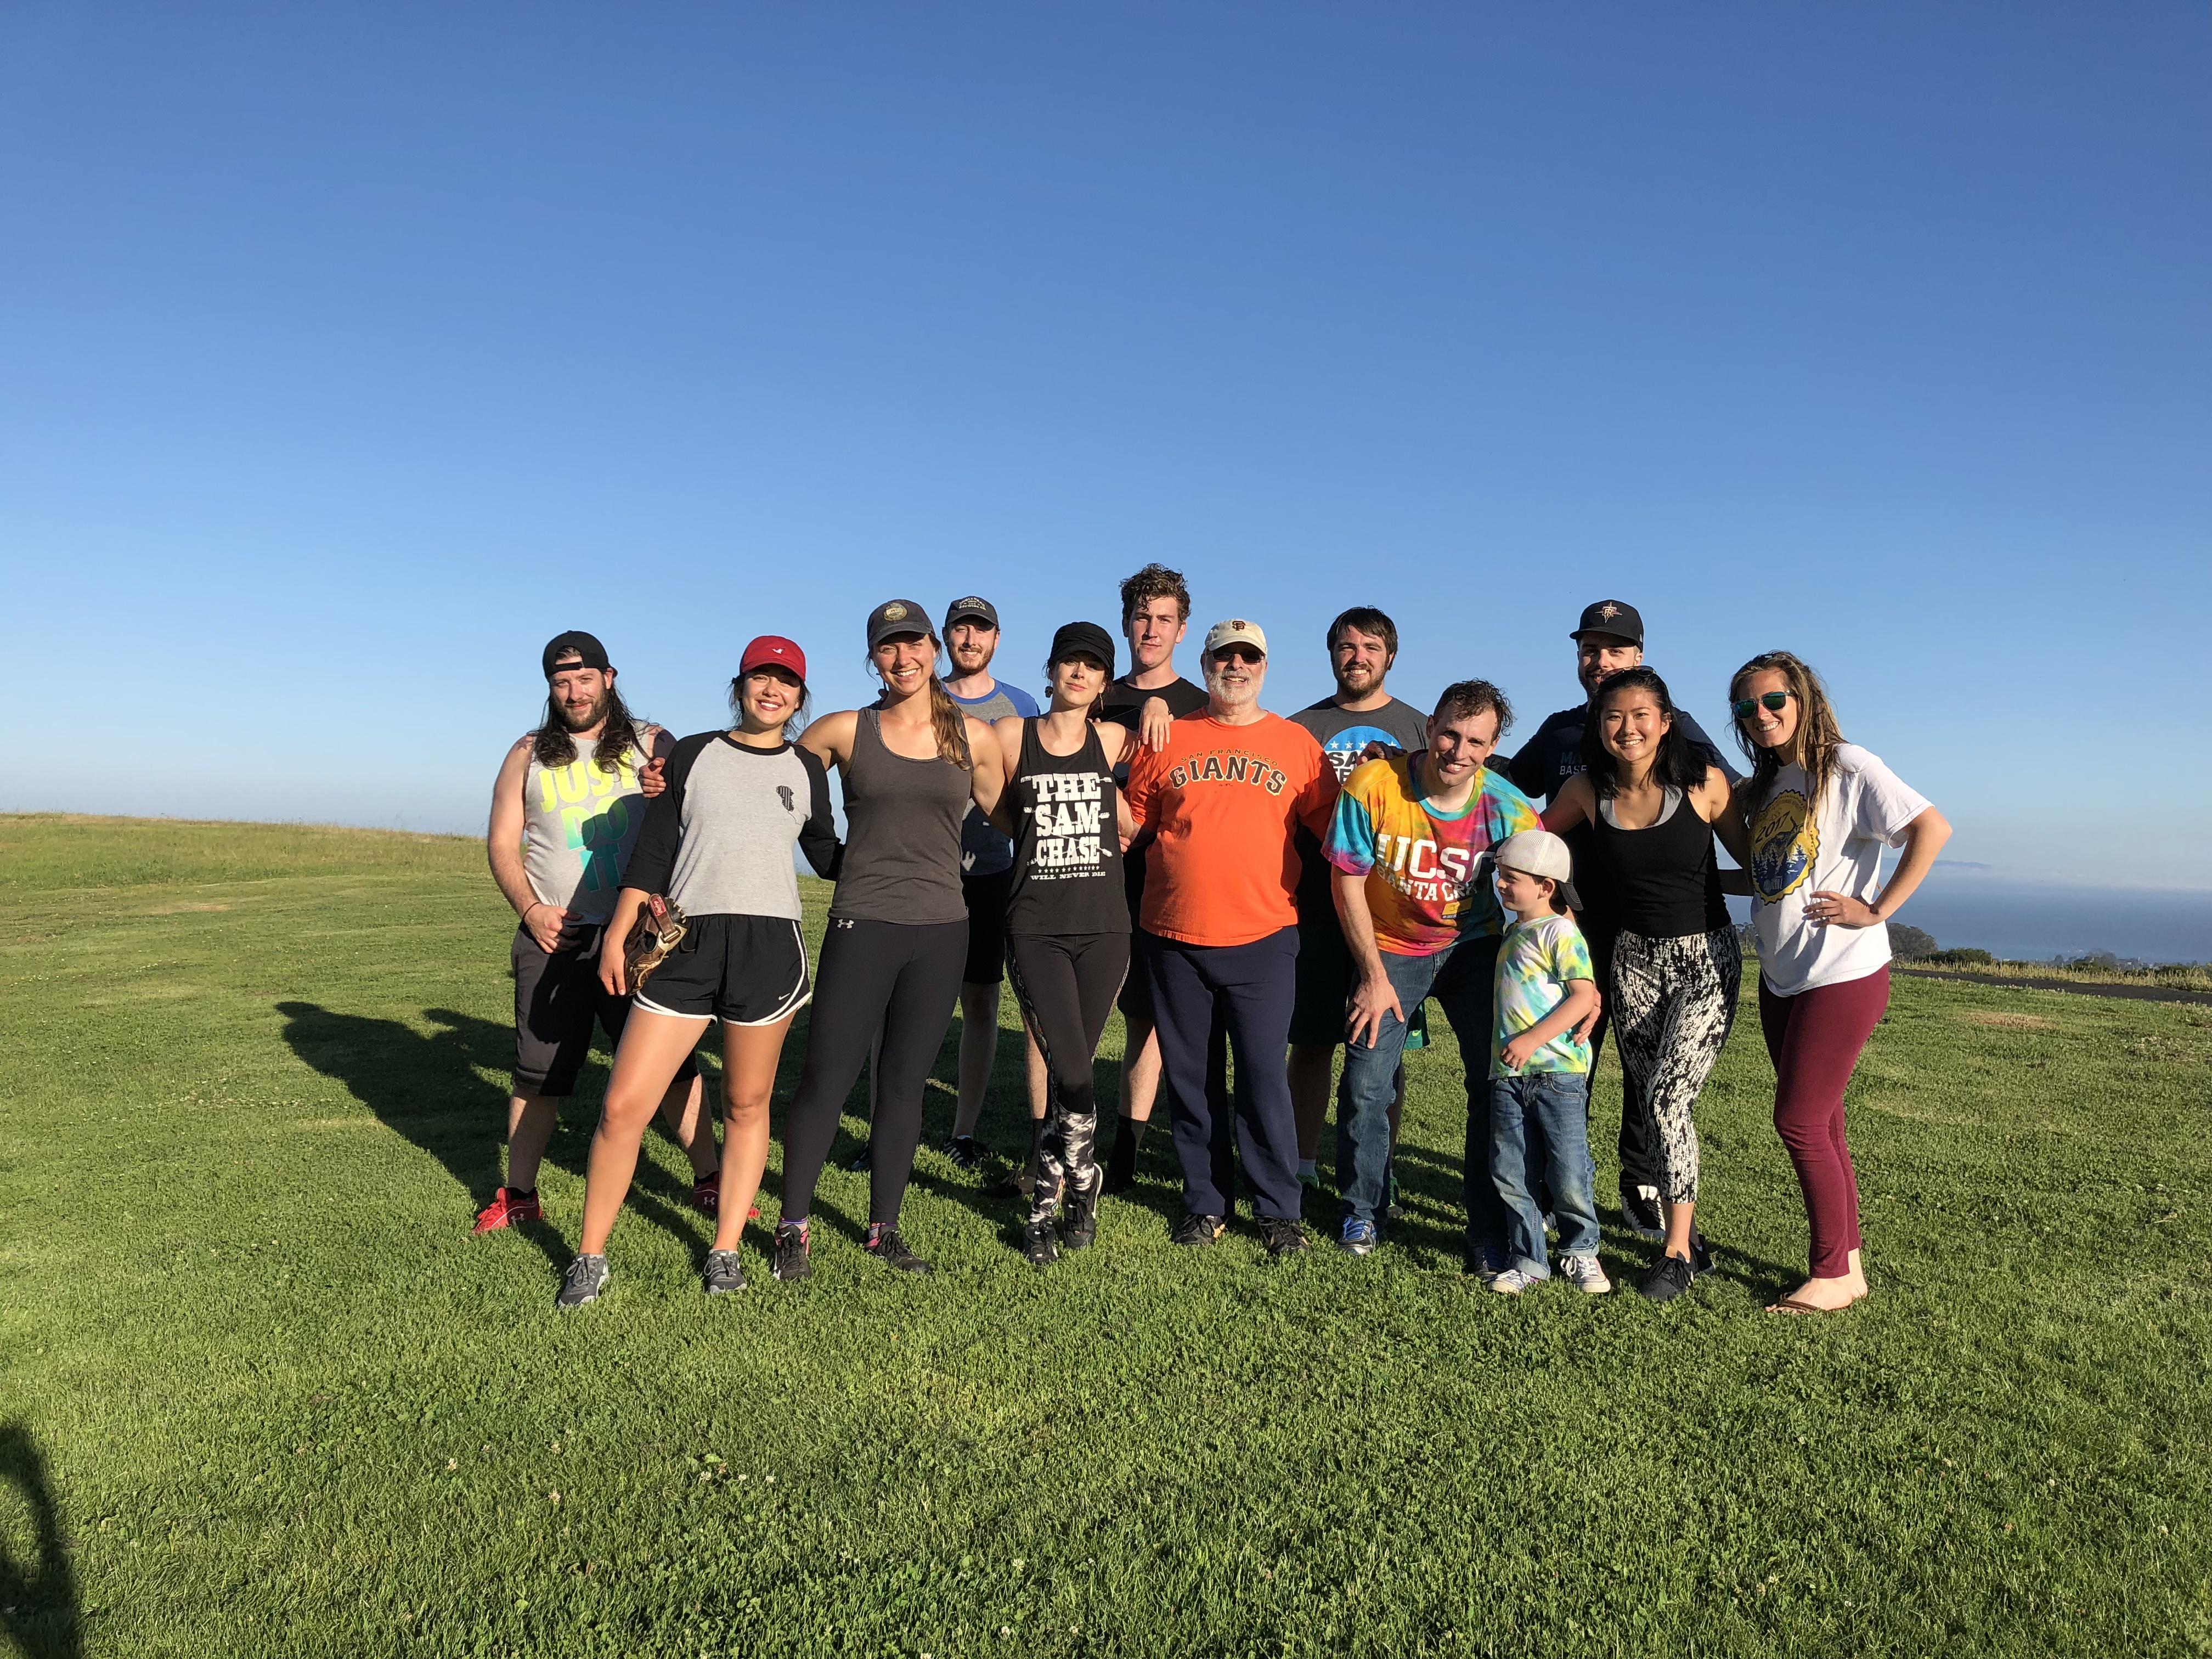 Spring 2018 Coed Softball Team